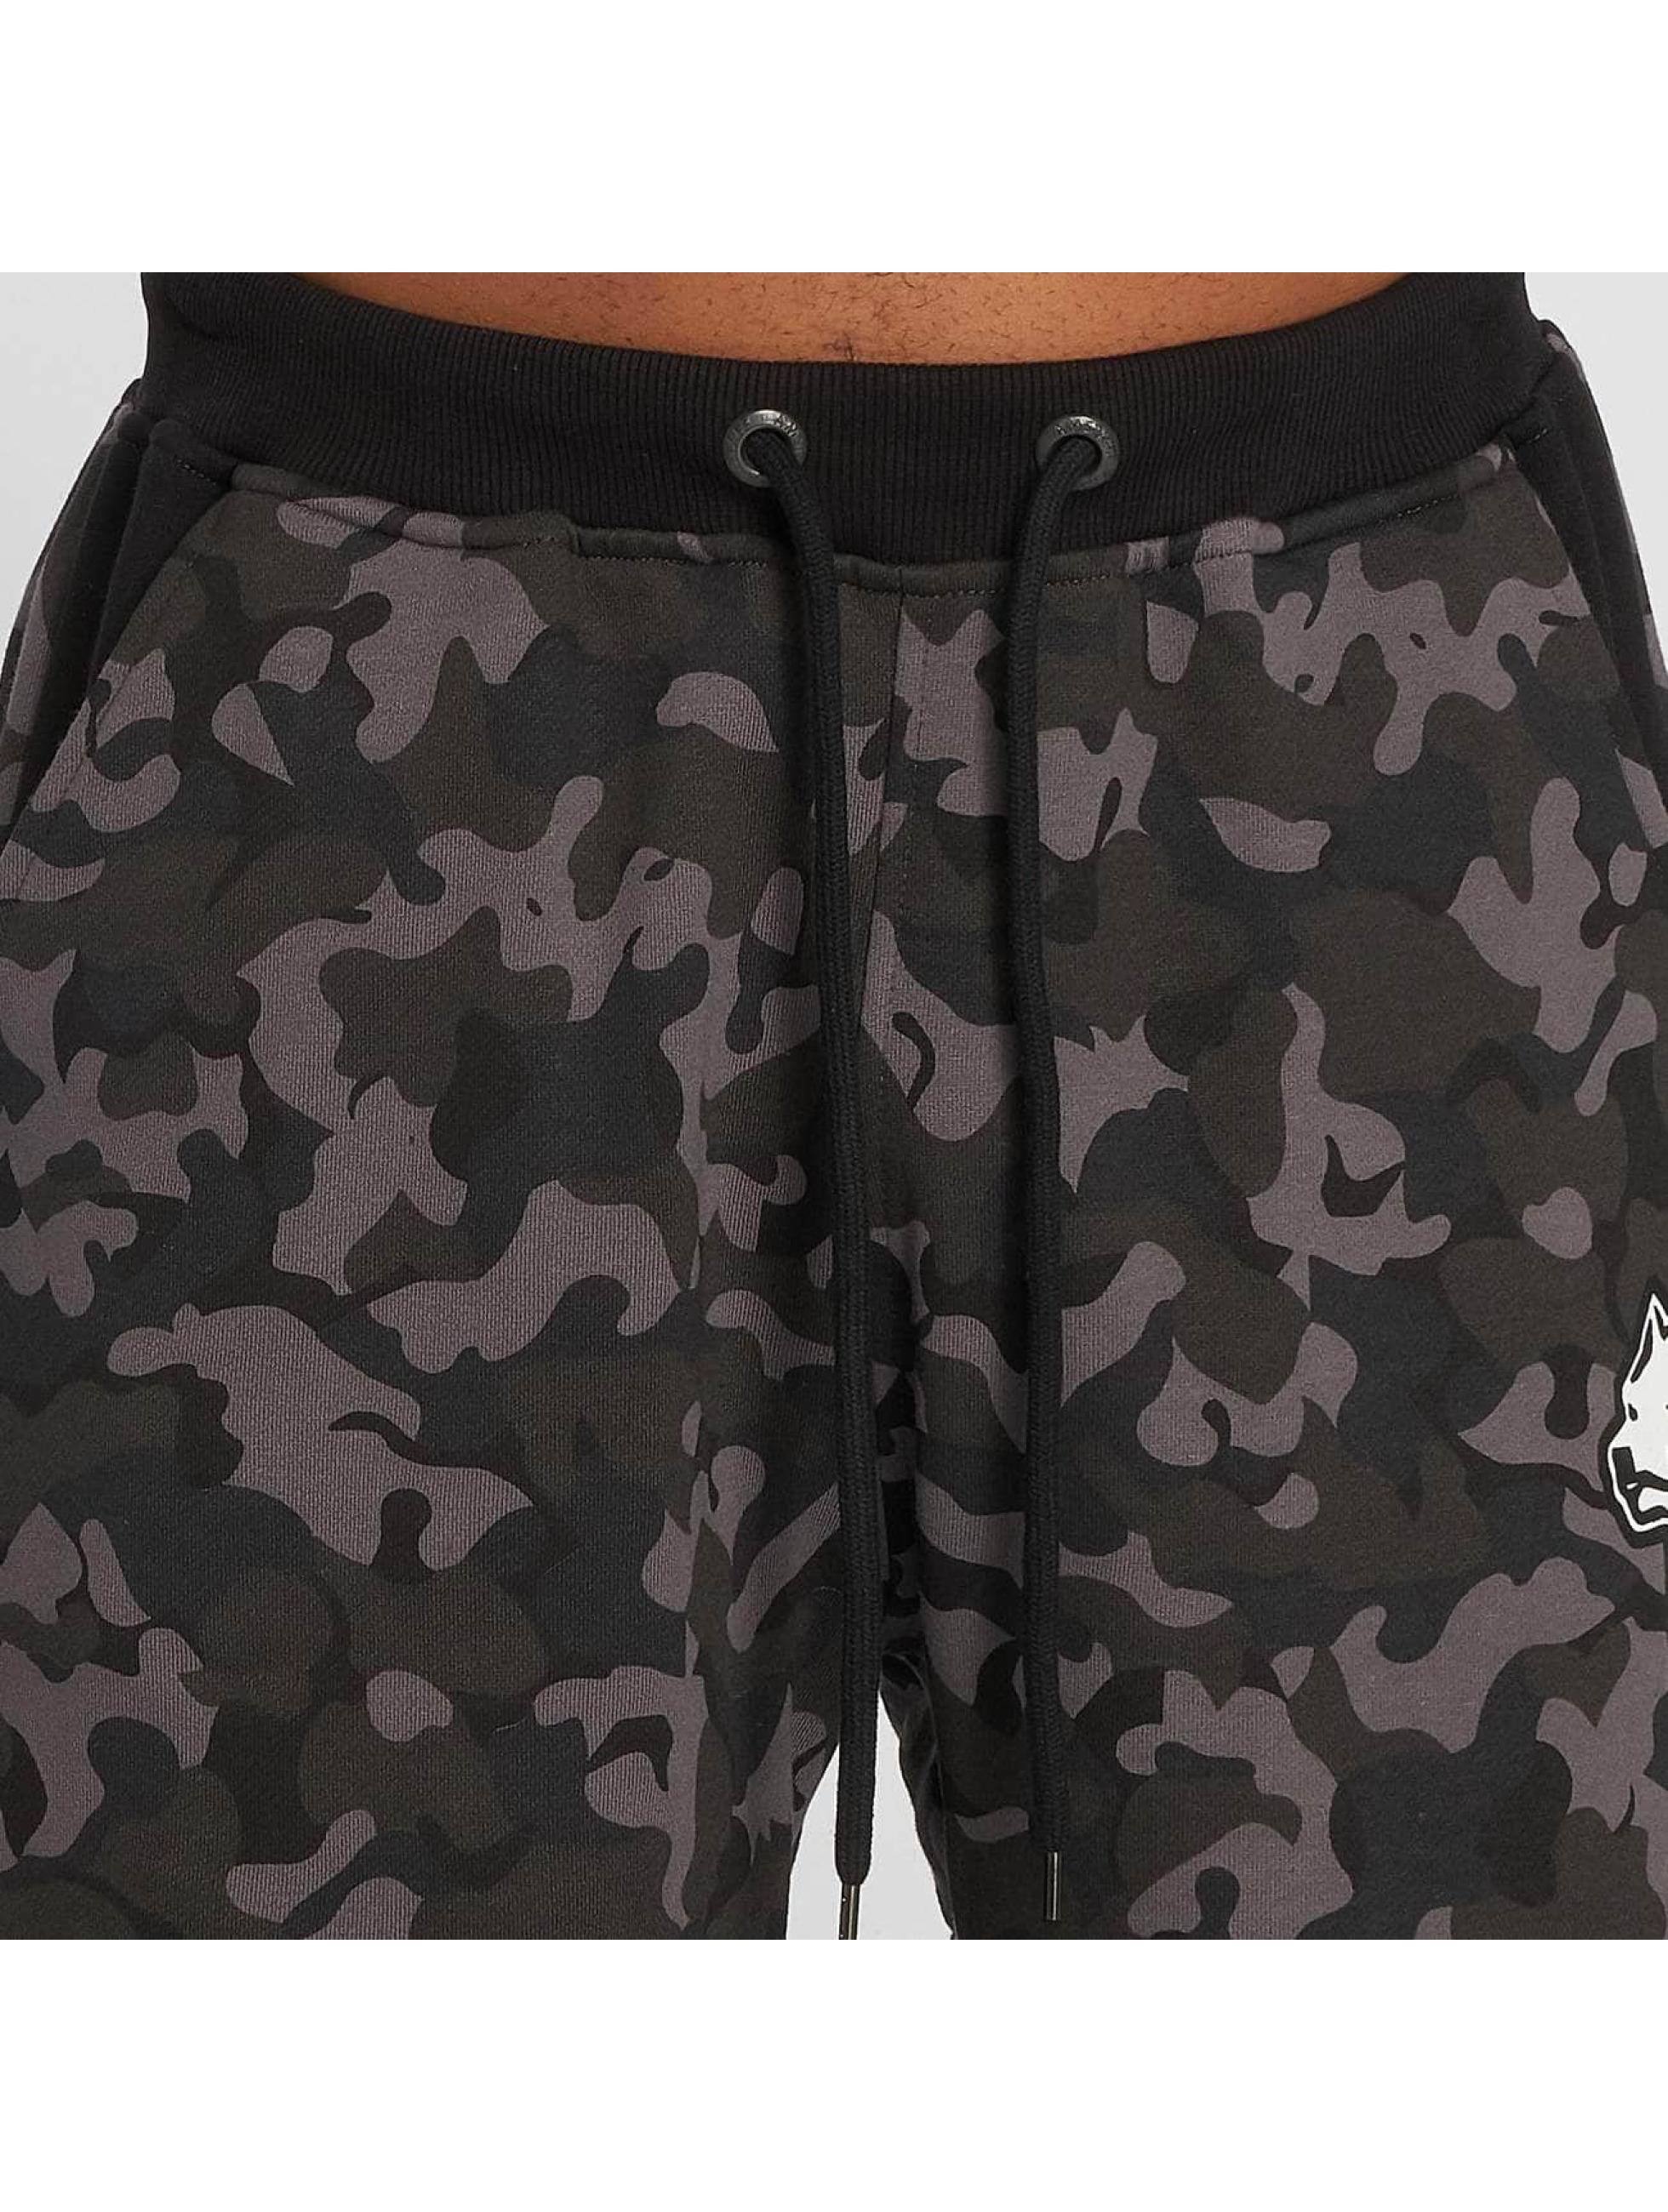 Amstaff Short Marox camouflage